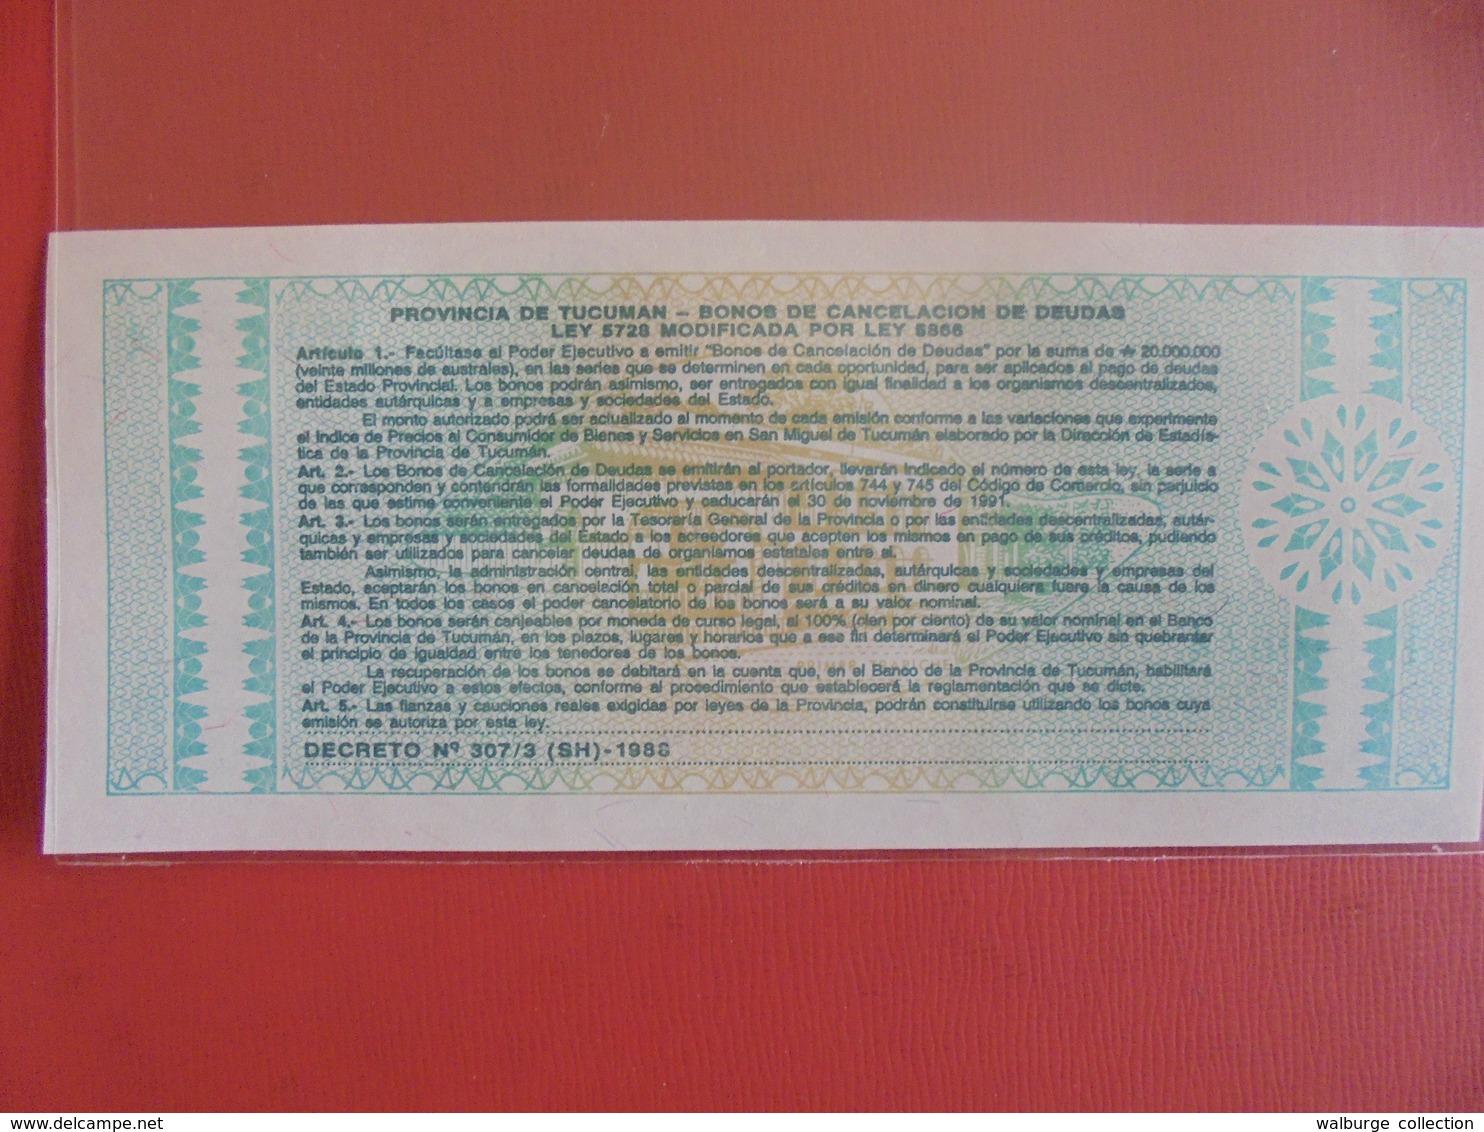 ARGENTINE(PROVINCE TUCUMAN) 1 AUSTRAL 1991 PEU CIRCULER/NEUF - Argentine